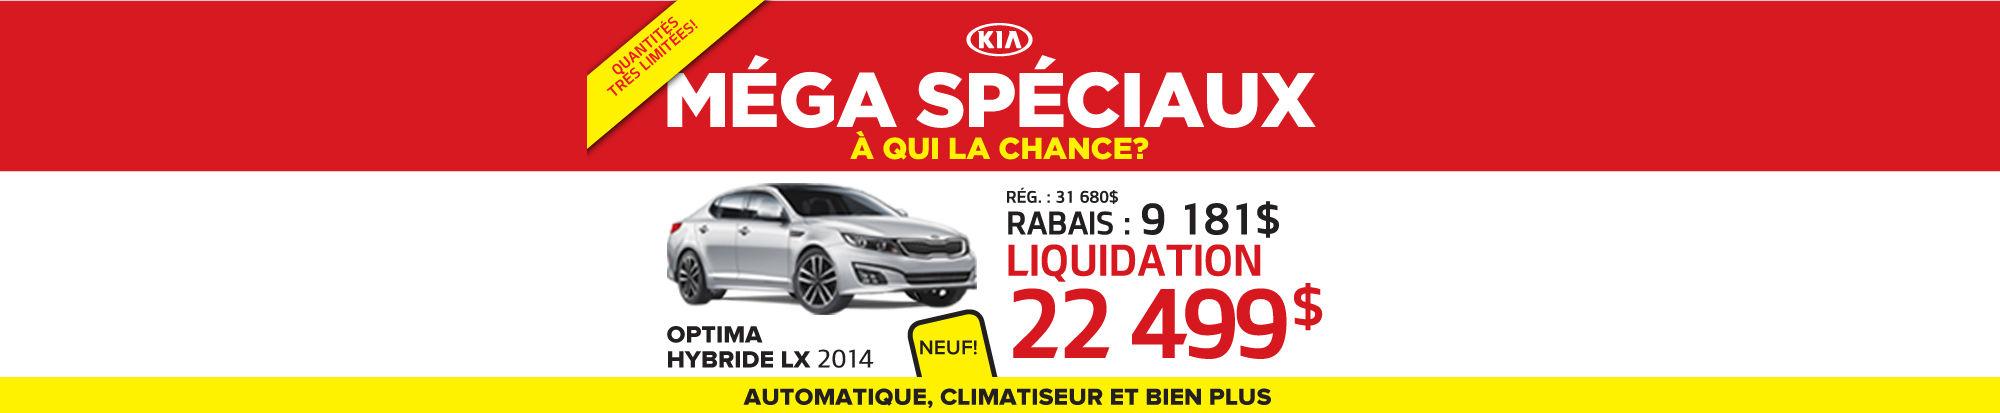 Optima lx hybride 2014